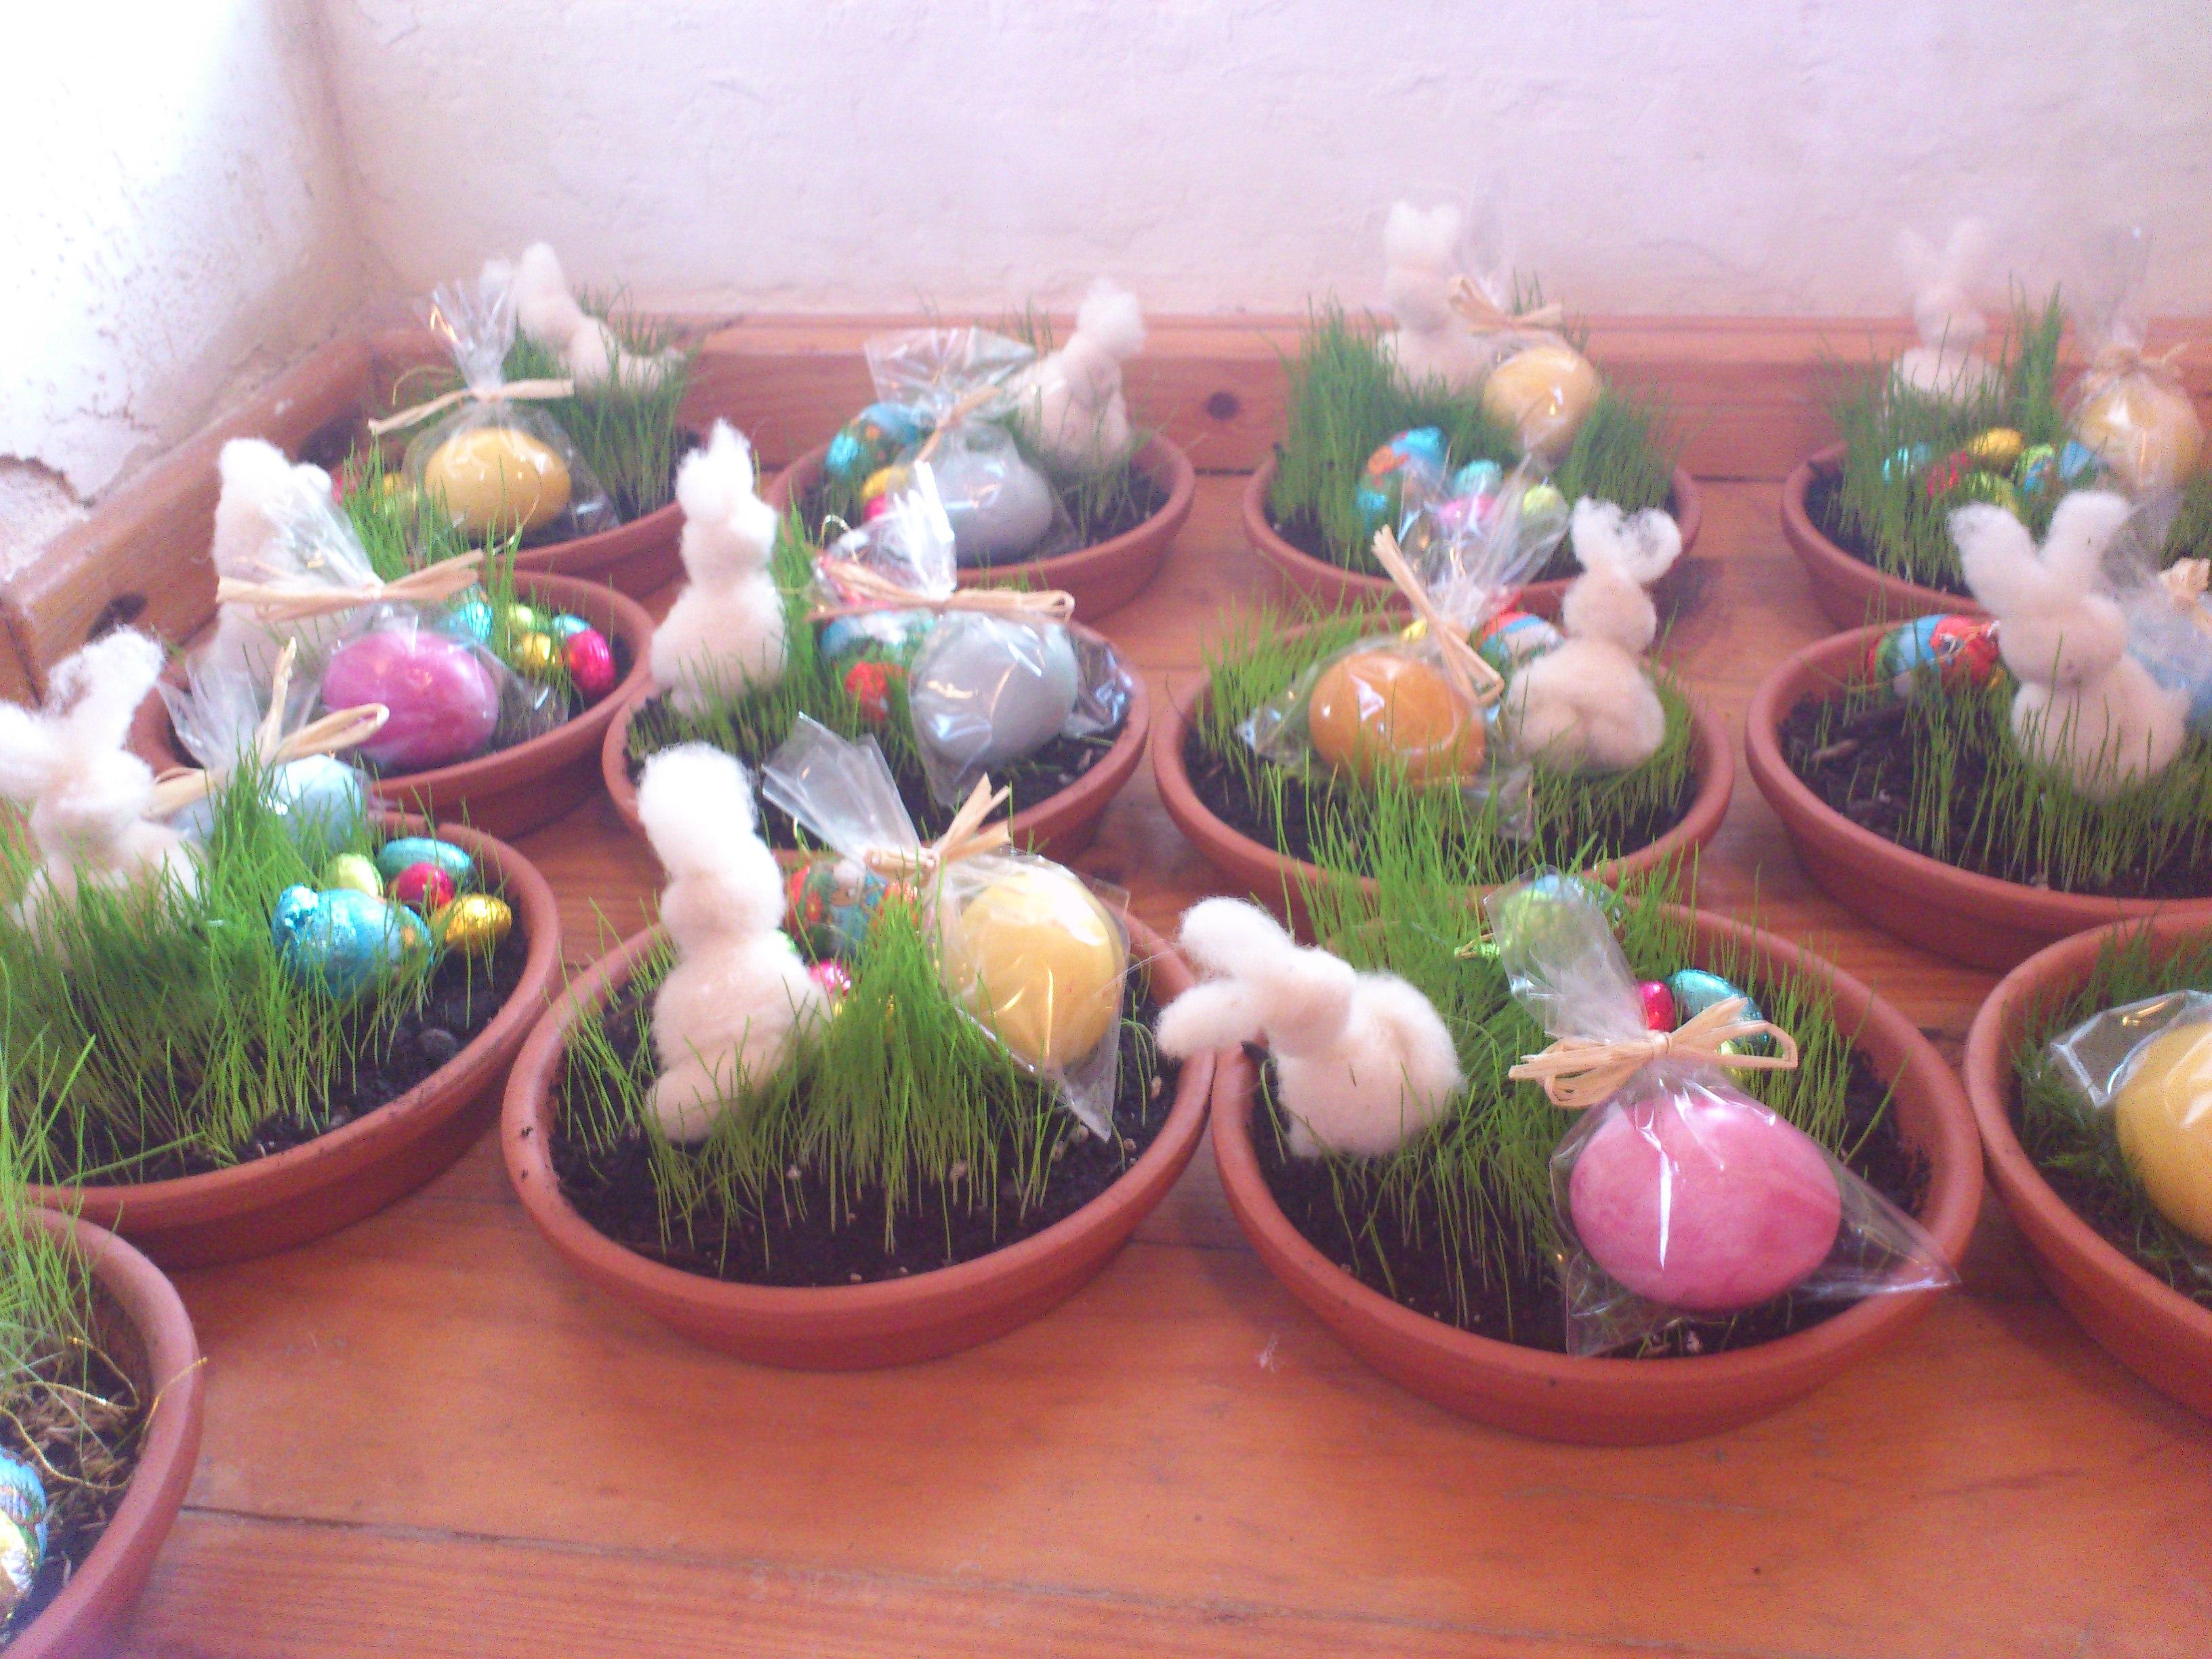 Día de la liebre de Pascua